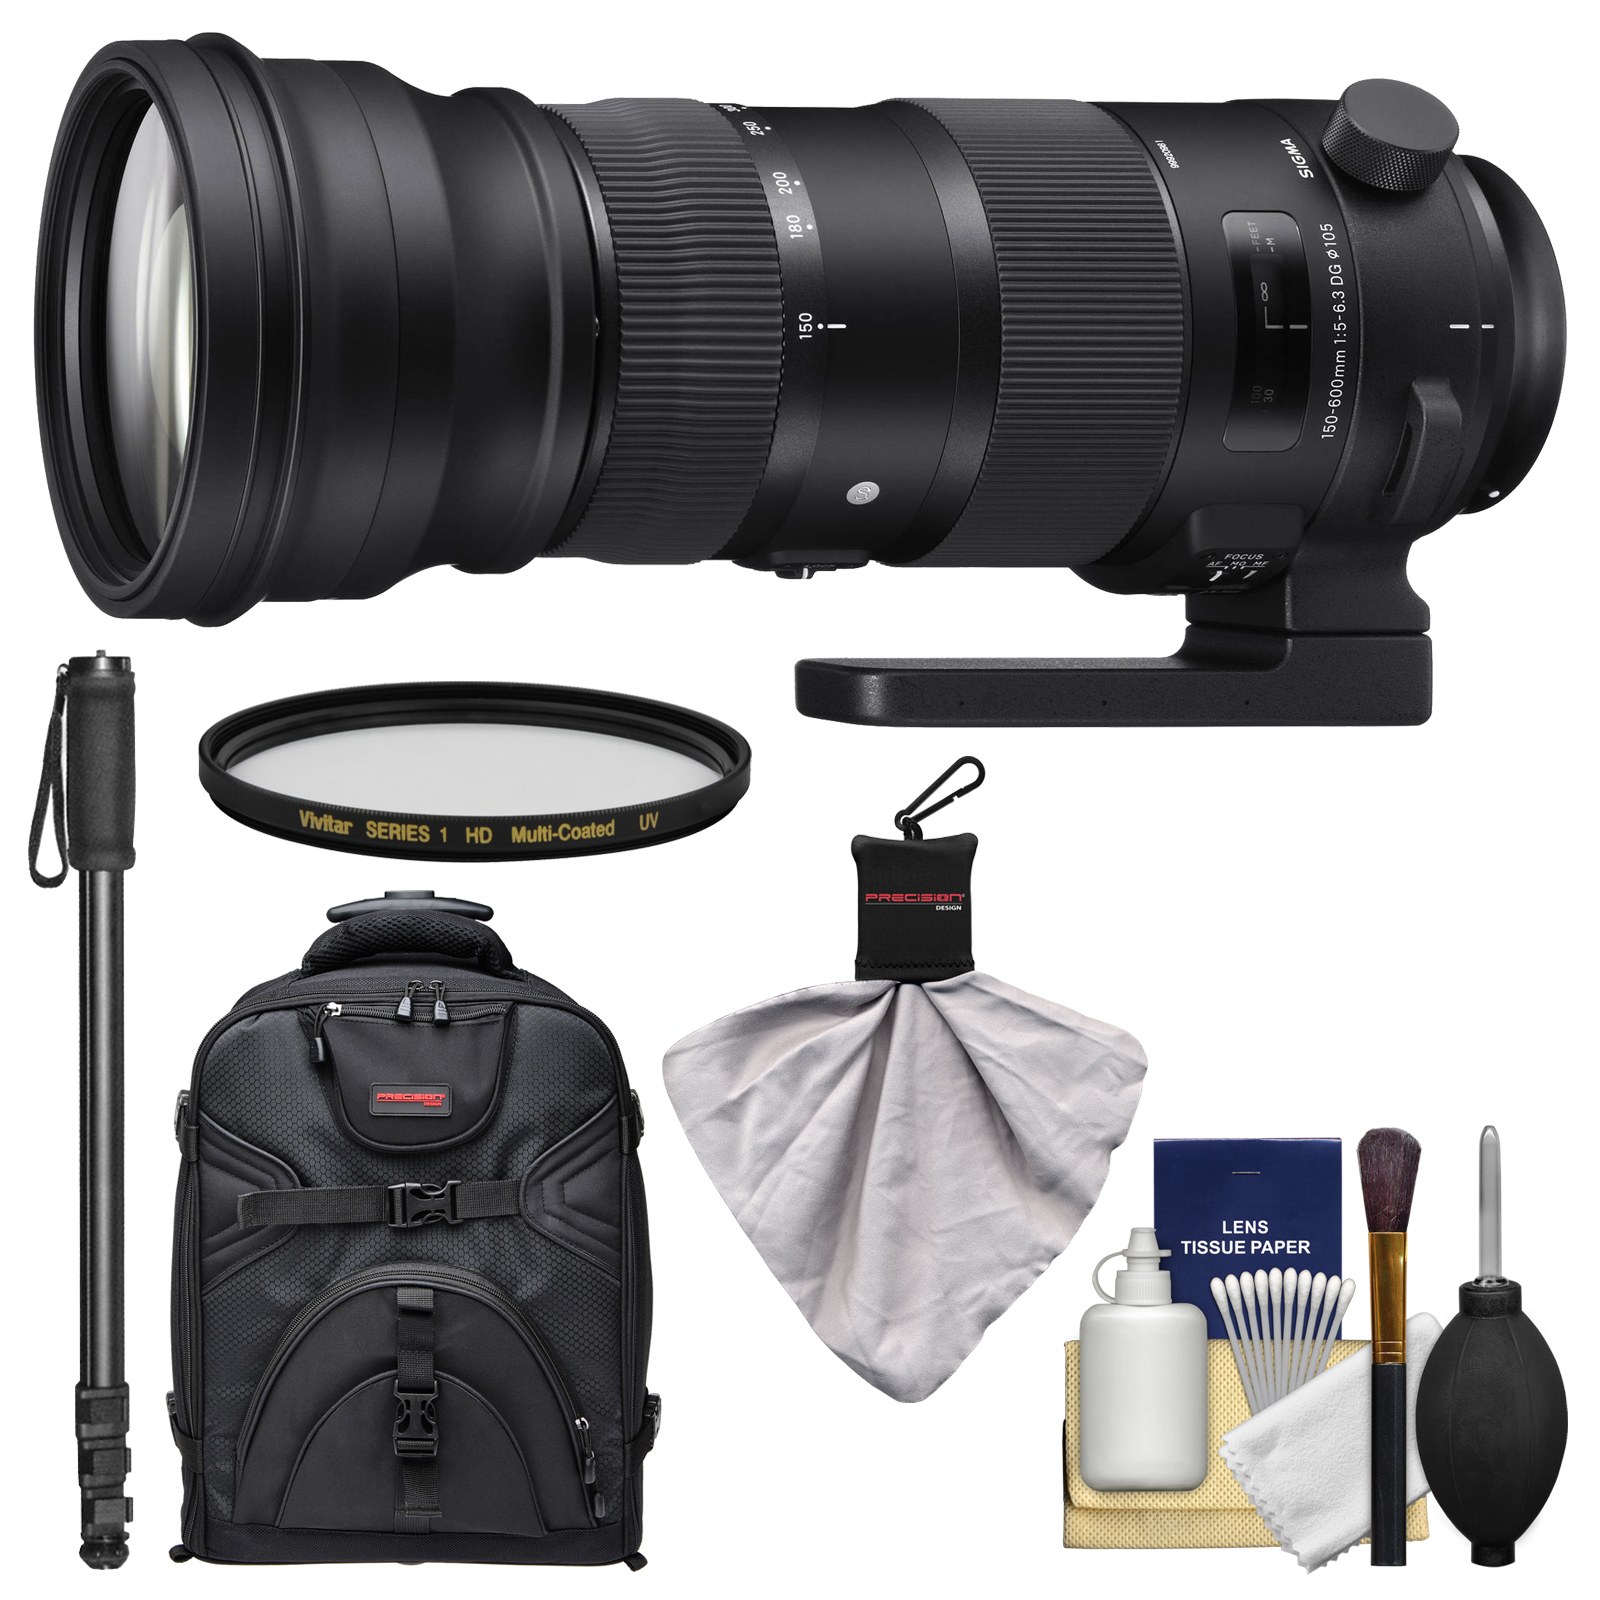 Sigma 150 - 600mm f / 5.0 - 6.3 Sports DG OS HSM Zoom Lens + Backpack + Filters + Monopod Kit for Nikon D3300, D5500, D7100, D7200, D610, D750, D810, D4s Cameras